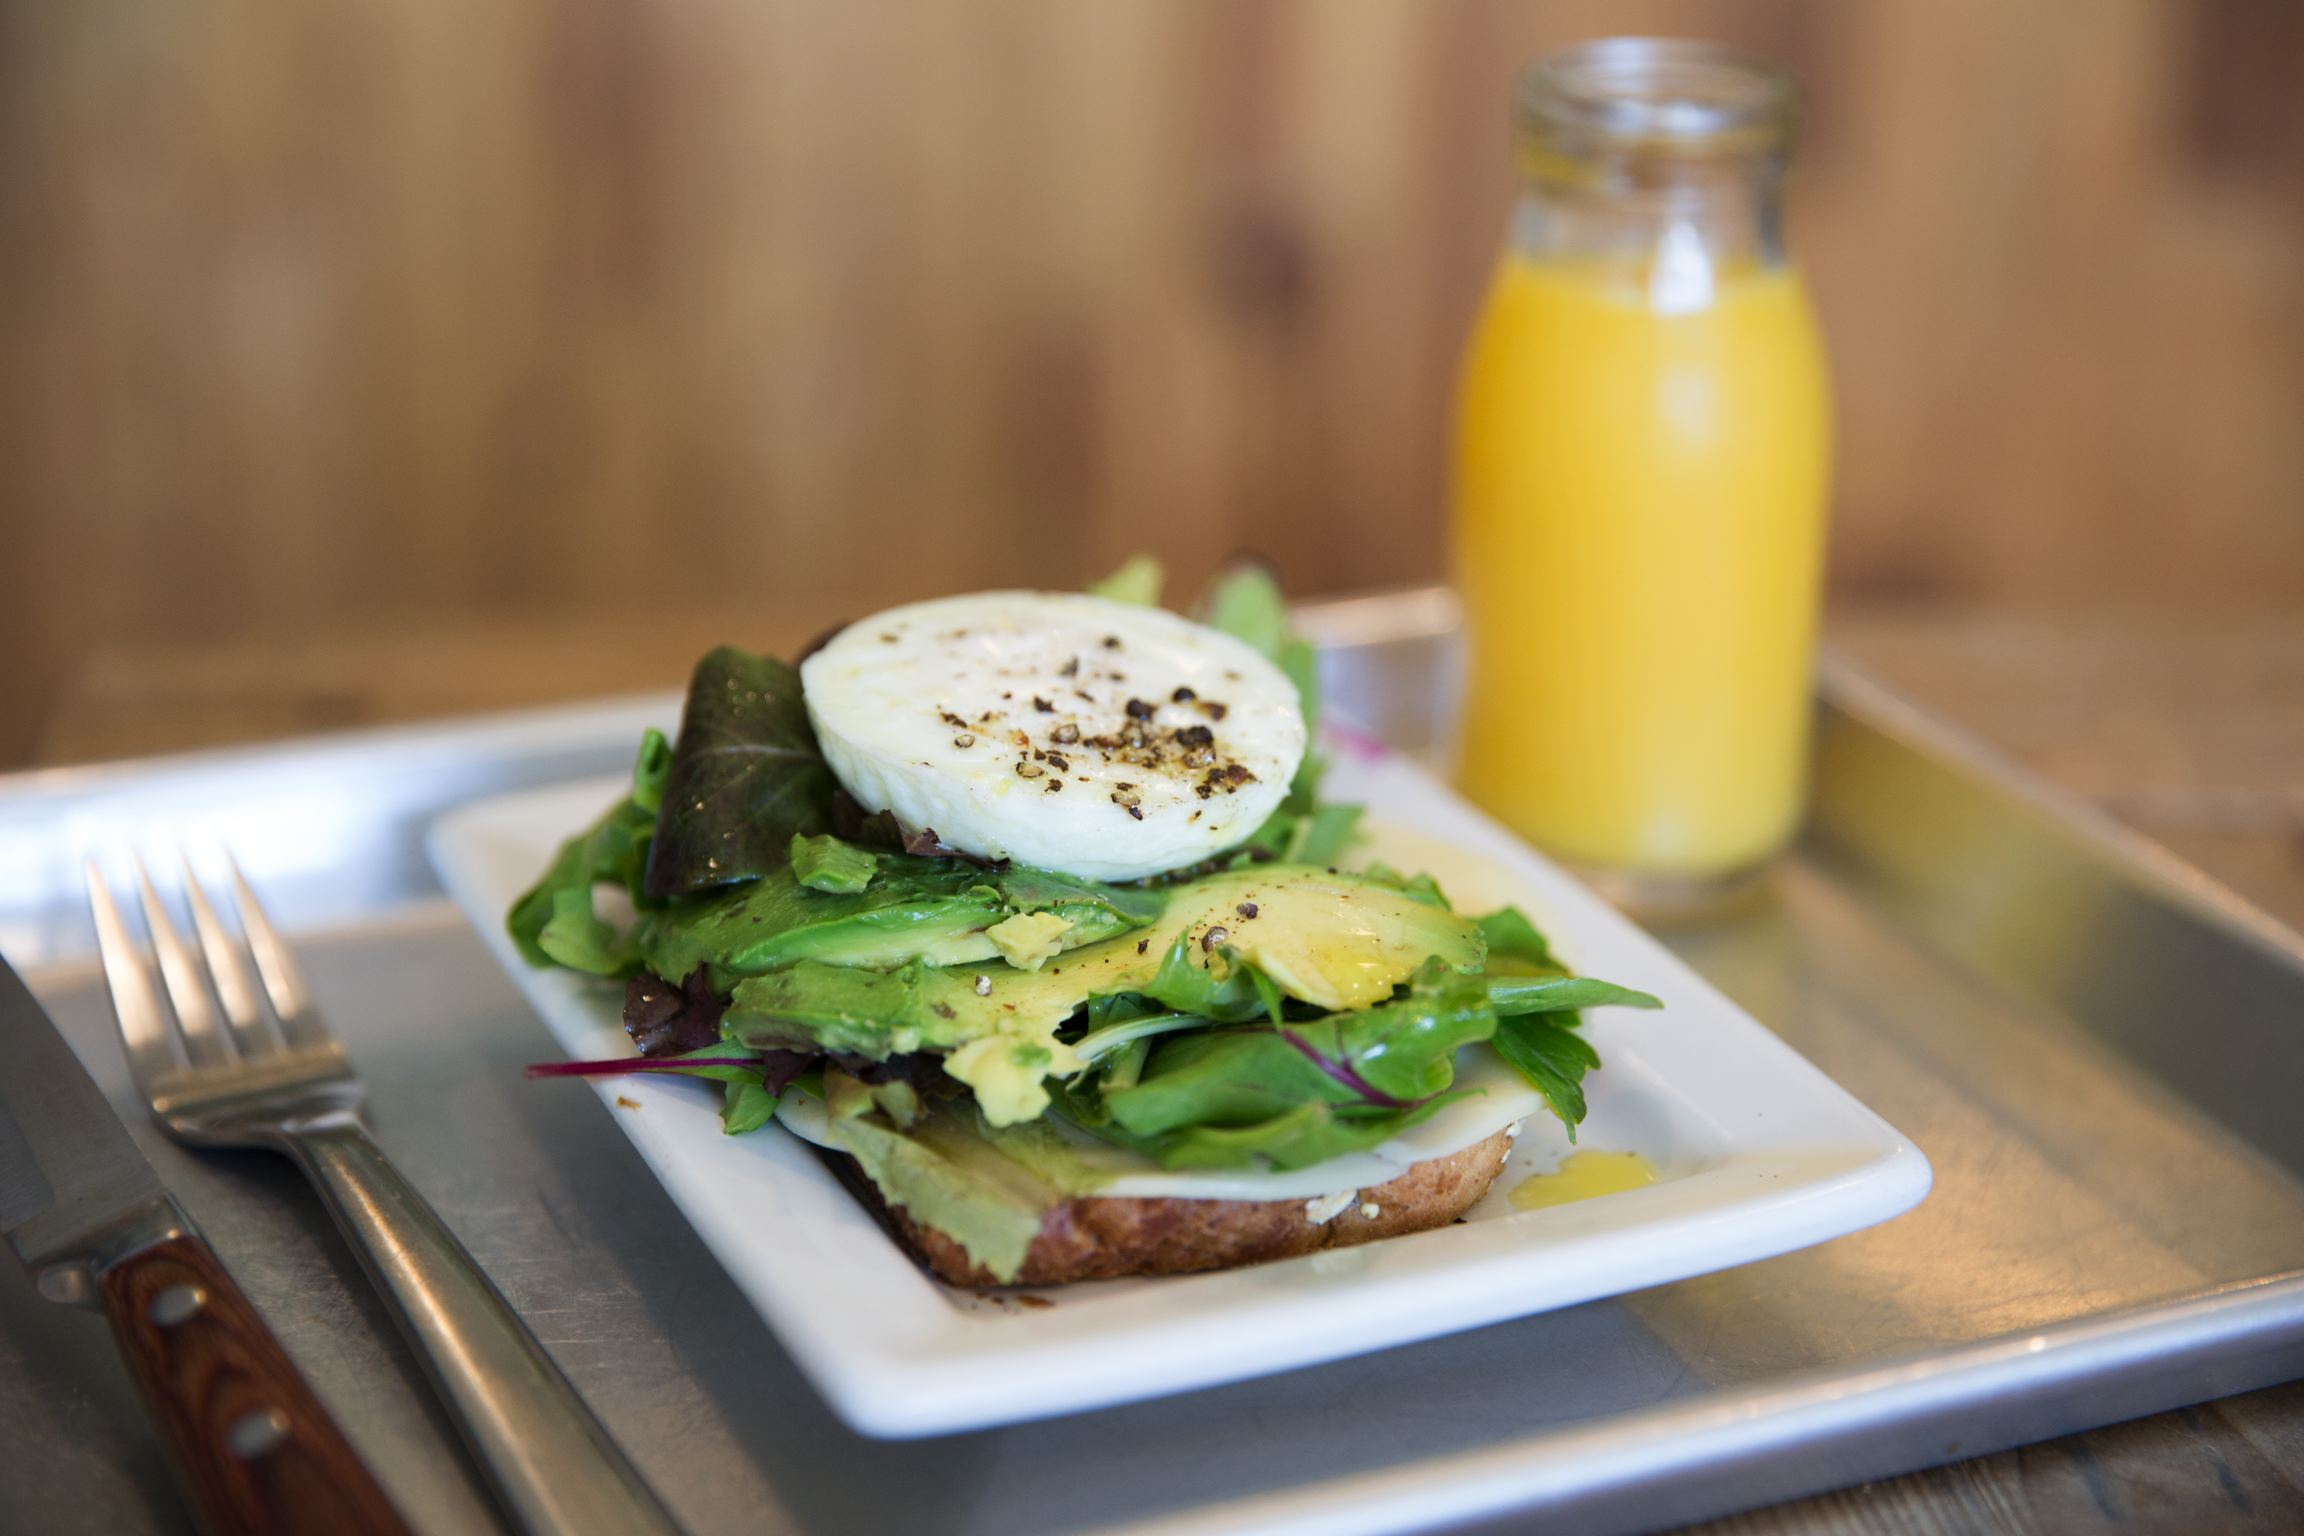 The Power Toast 1 egg ( 9am - 11Am) Image